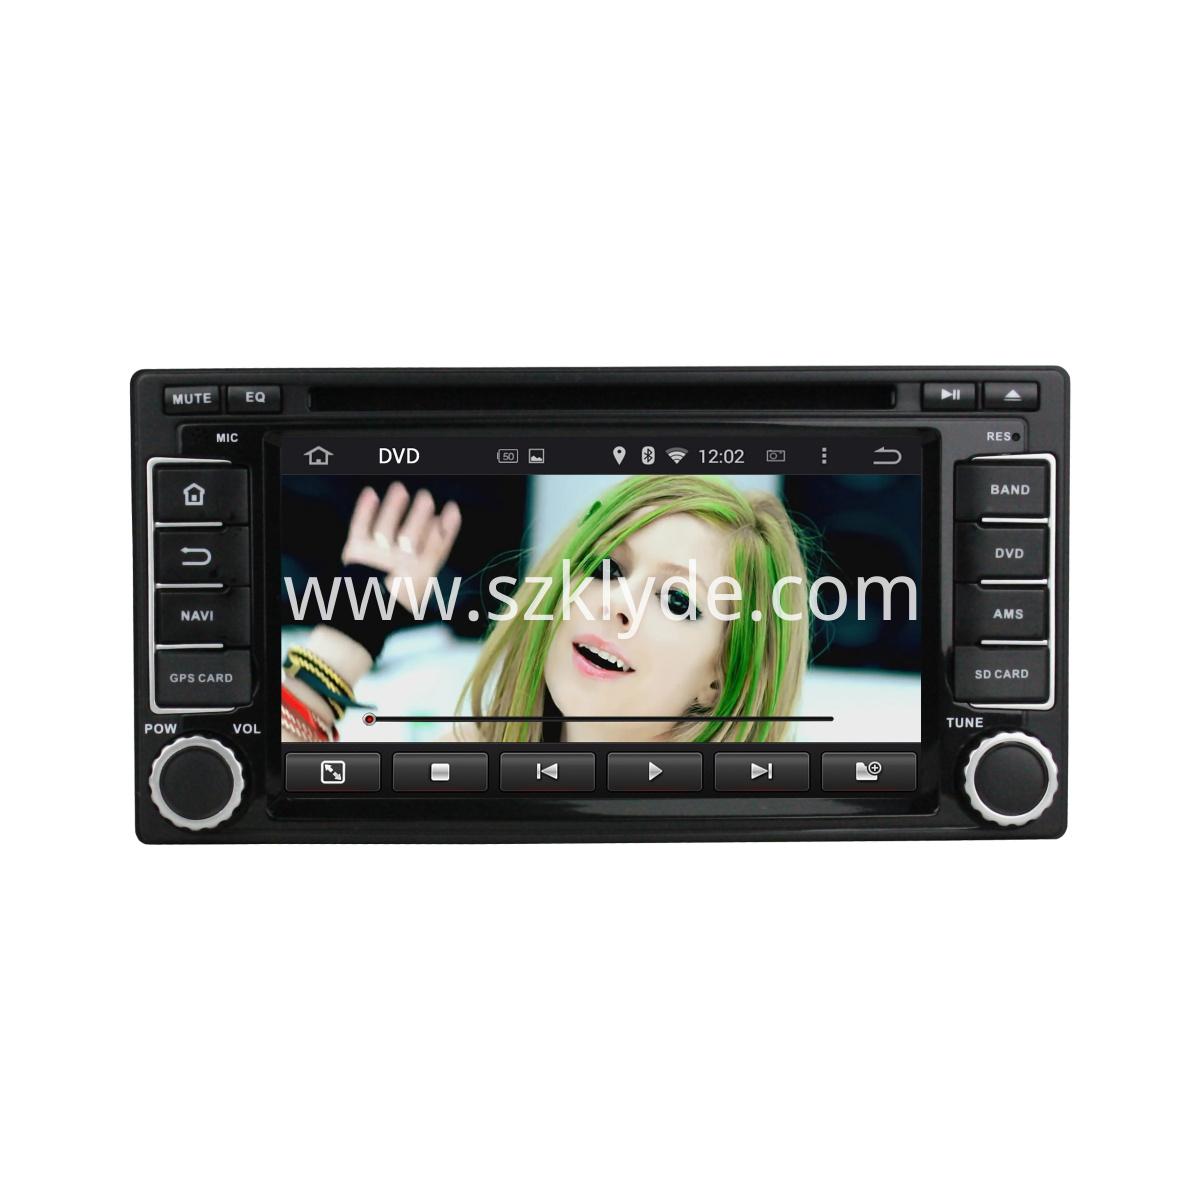 Subaru Forester/Impreza android car DVD player